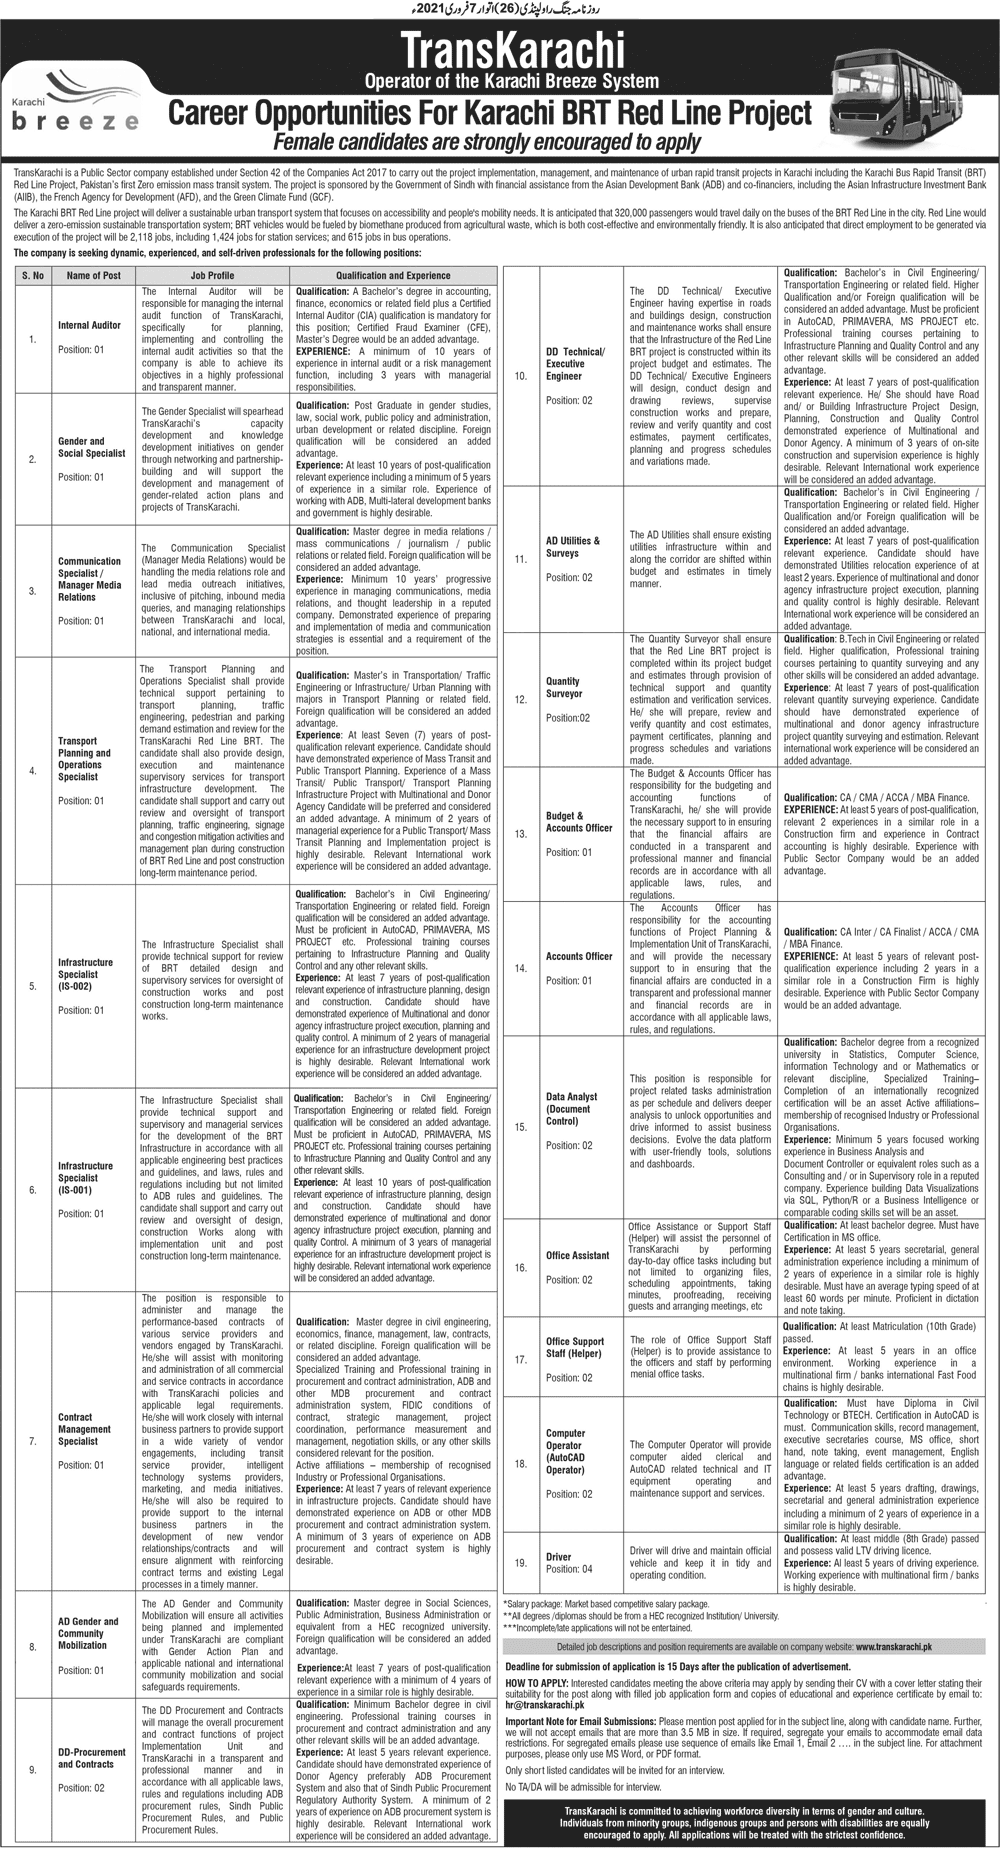 Download Bus Rapid Transit BRT Jobs 2021Application Form - www.transkarachi.pk - Rapid Transit - BRT Karachi - Bus Rapid Transit Jobs 2021 - BRT Jobs 2021